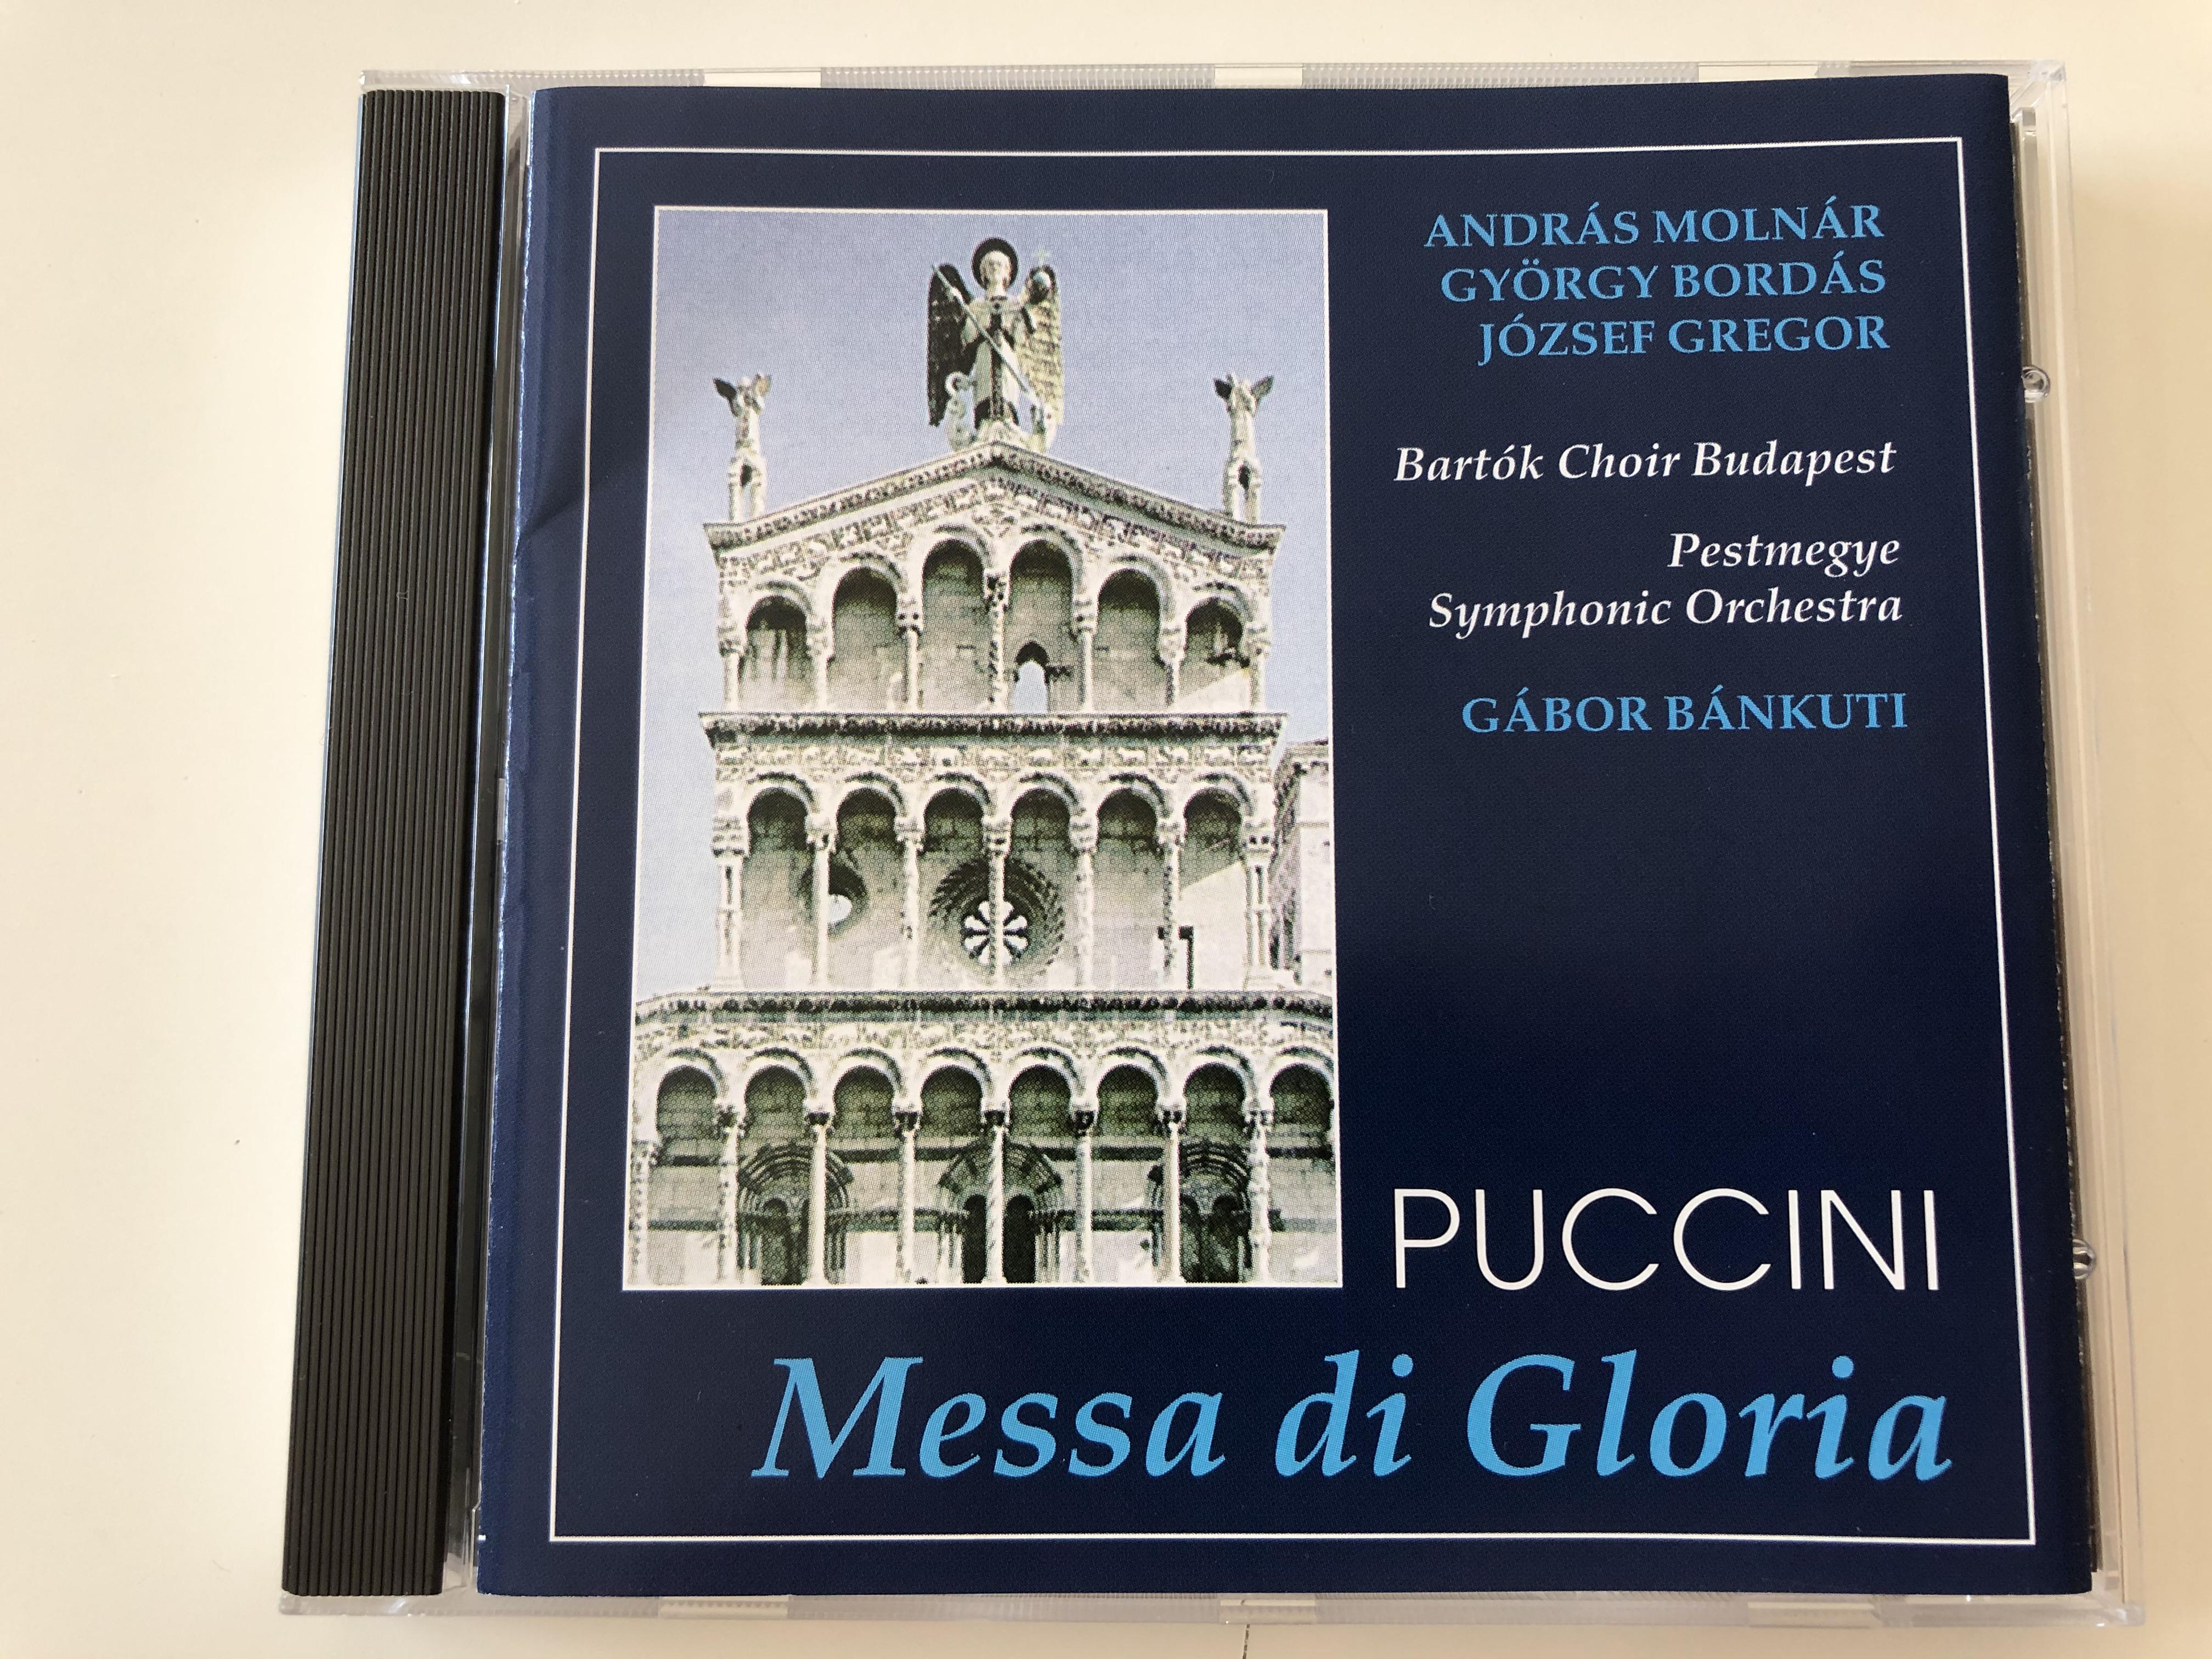 puccini-messa-di-gloria-andr-s-moln-r-gy-rgy-bord-s-jozsef-gregor-bart-k-choir-budapest-pestmegye-symphonic-orchestra-g-bor-b-nkuti-allegro-thaler-audio-cd-1999-mza-039-1-.jpg